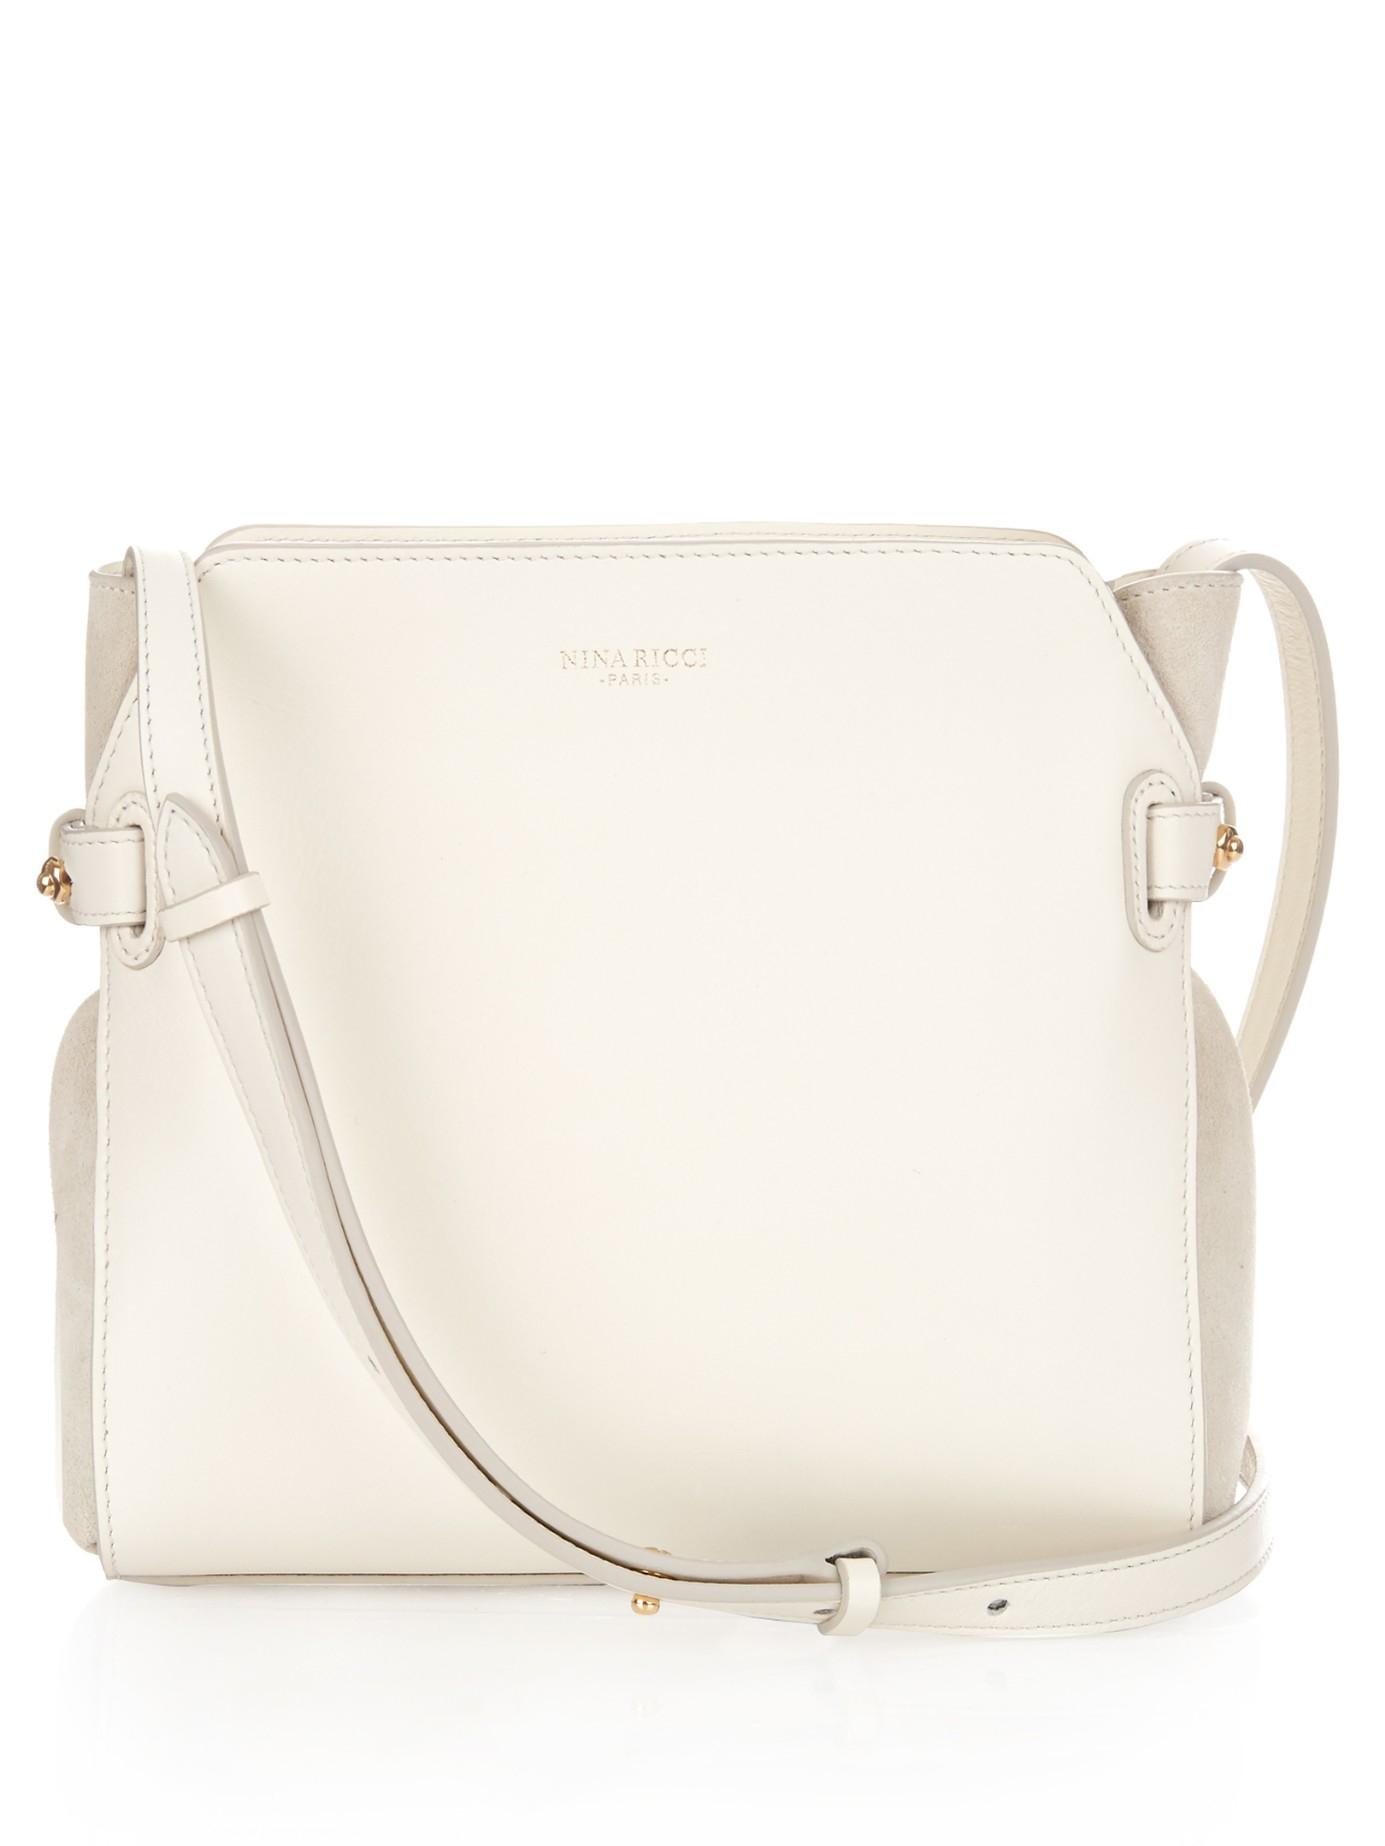 Nina Ricci Marché Leather Cross-Body Bag in White - Lyst 58372e689